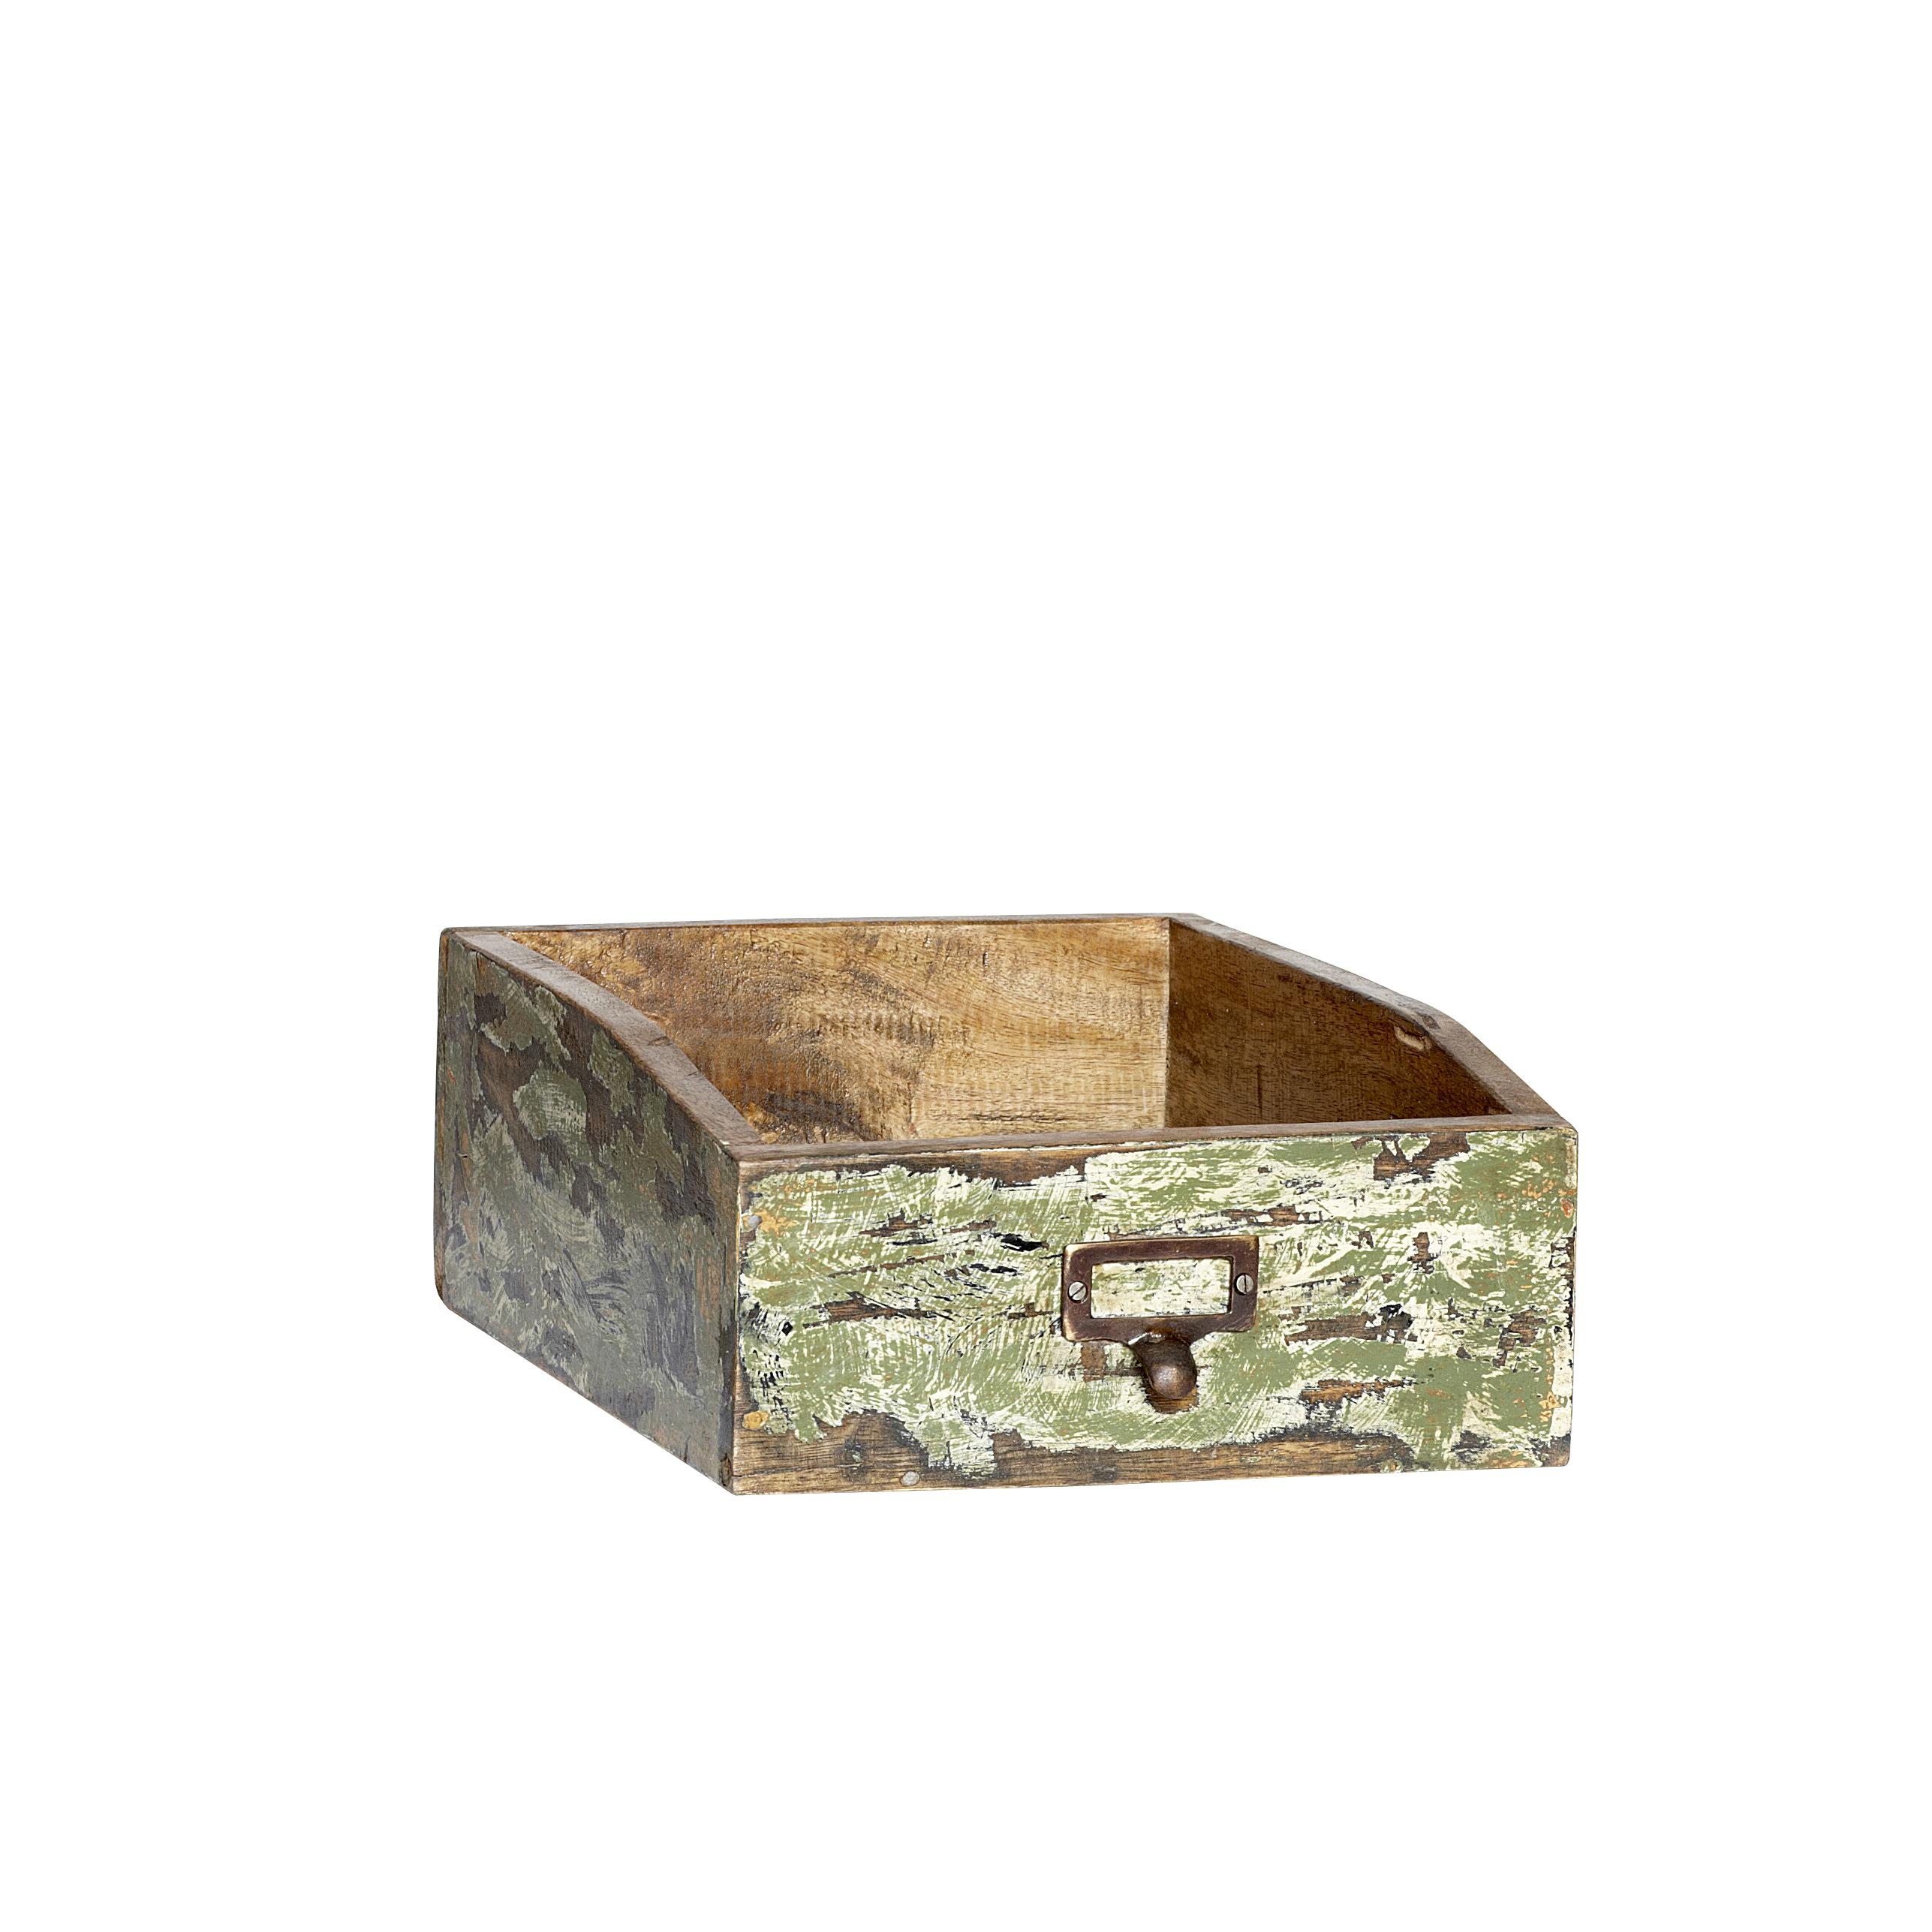 ablagebox f r format a4 aus recyceltem farbigen holz 0001187. Black Bedroom Furniture Sets. Home Design Ideas